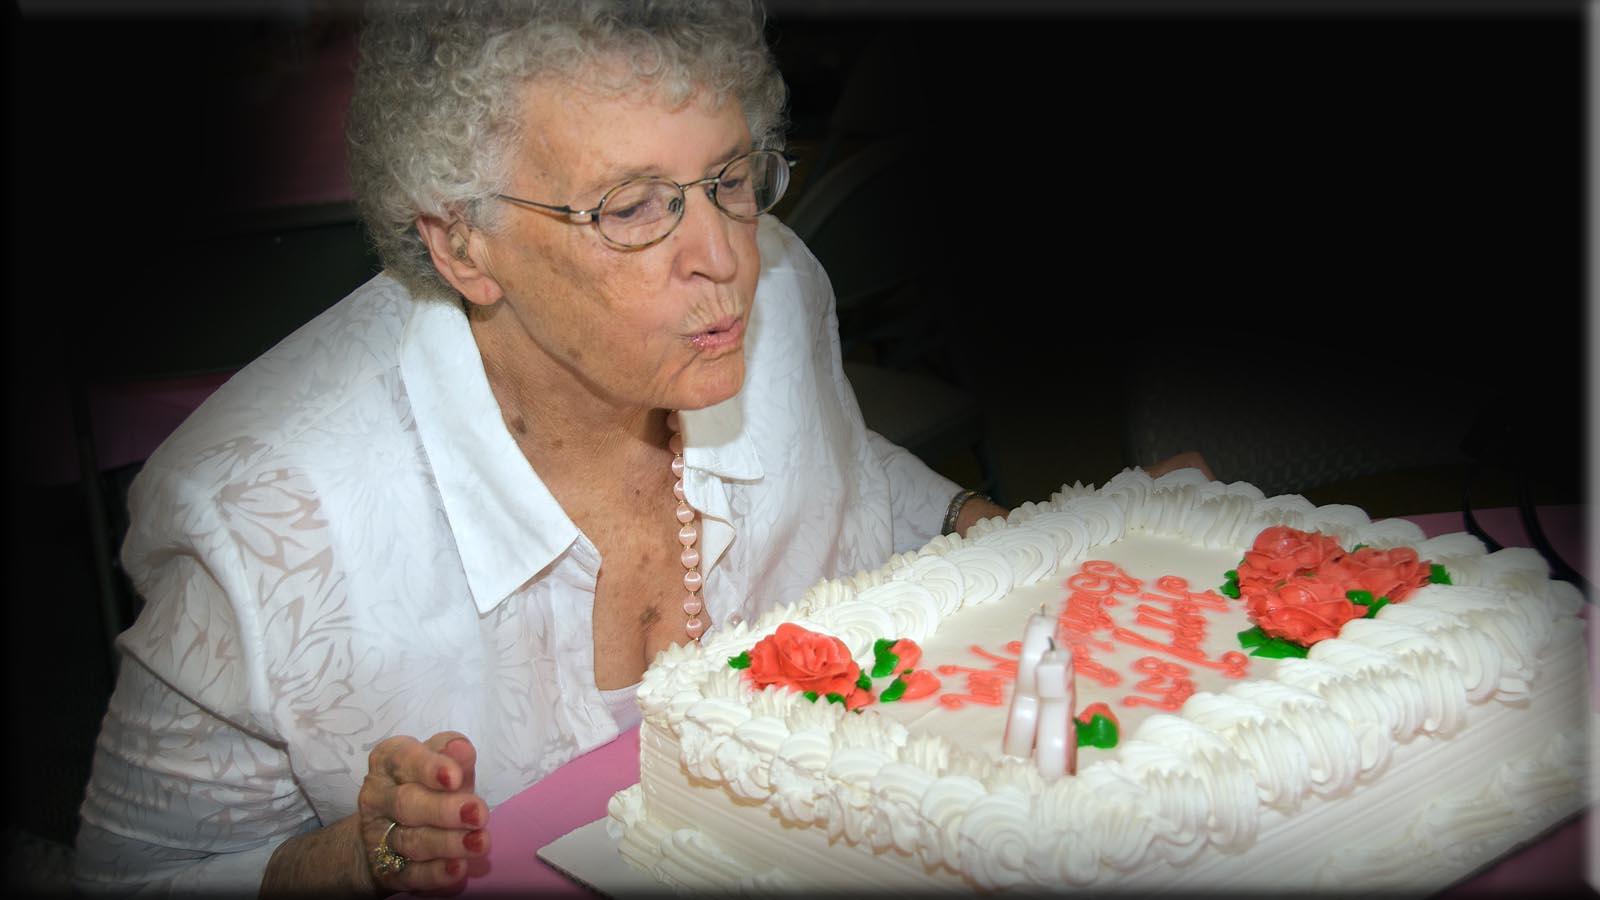 Virginia's 85th Birthday  6991 - 2009-06-13 at 17-38-24 II blog